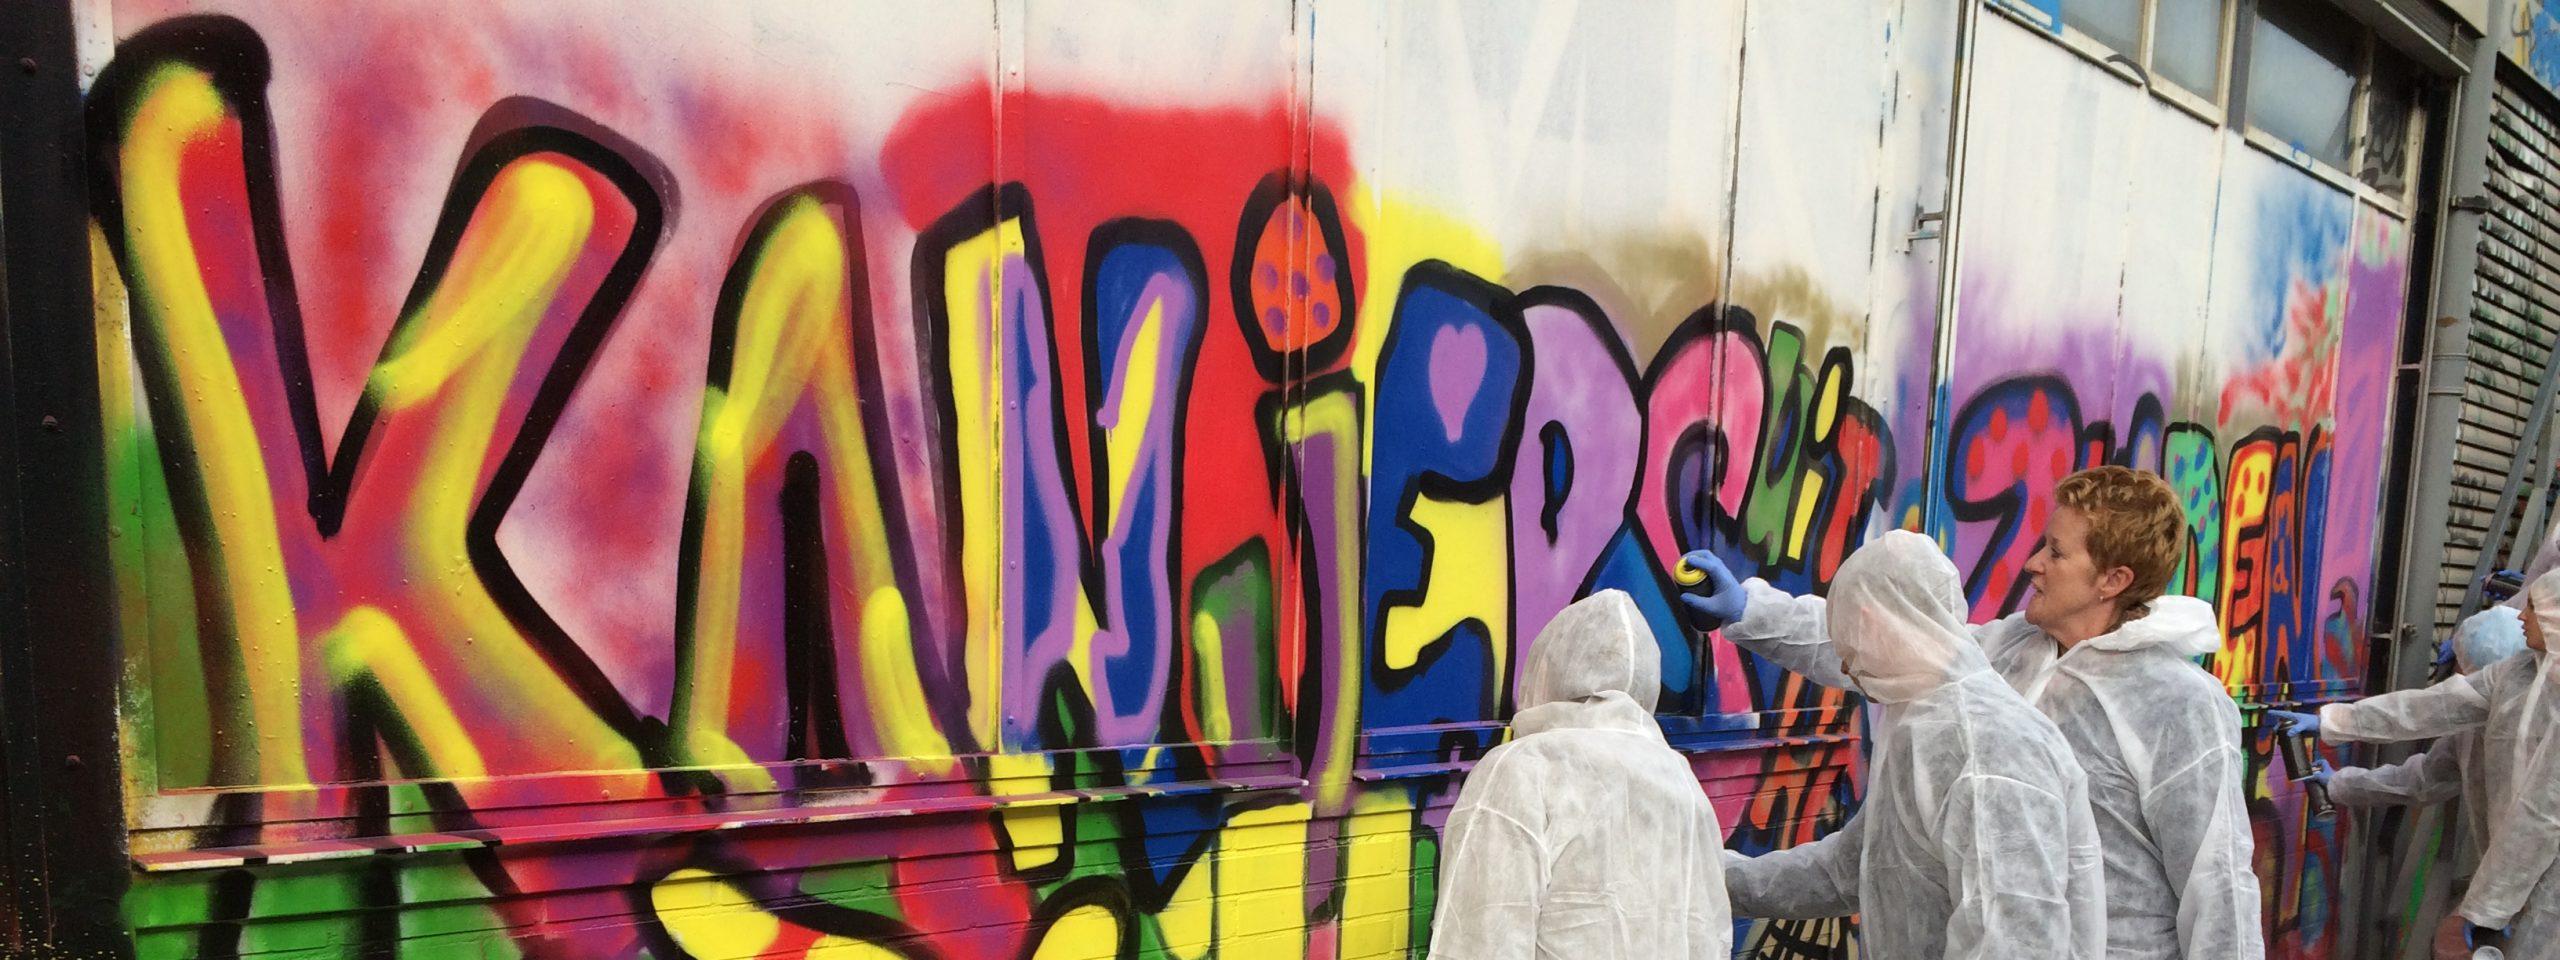 Crazy art tilburg/breda 5